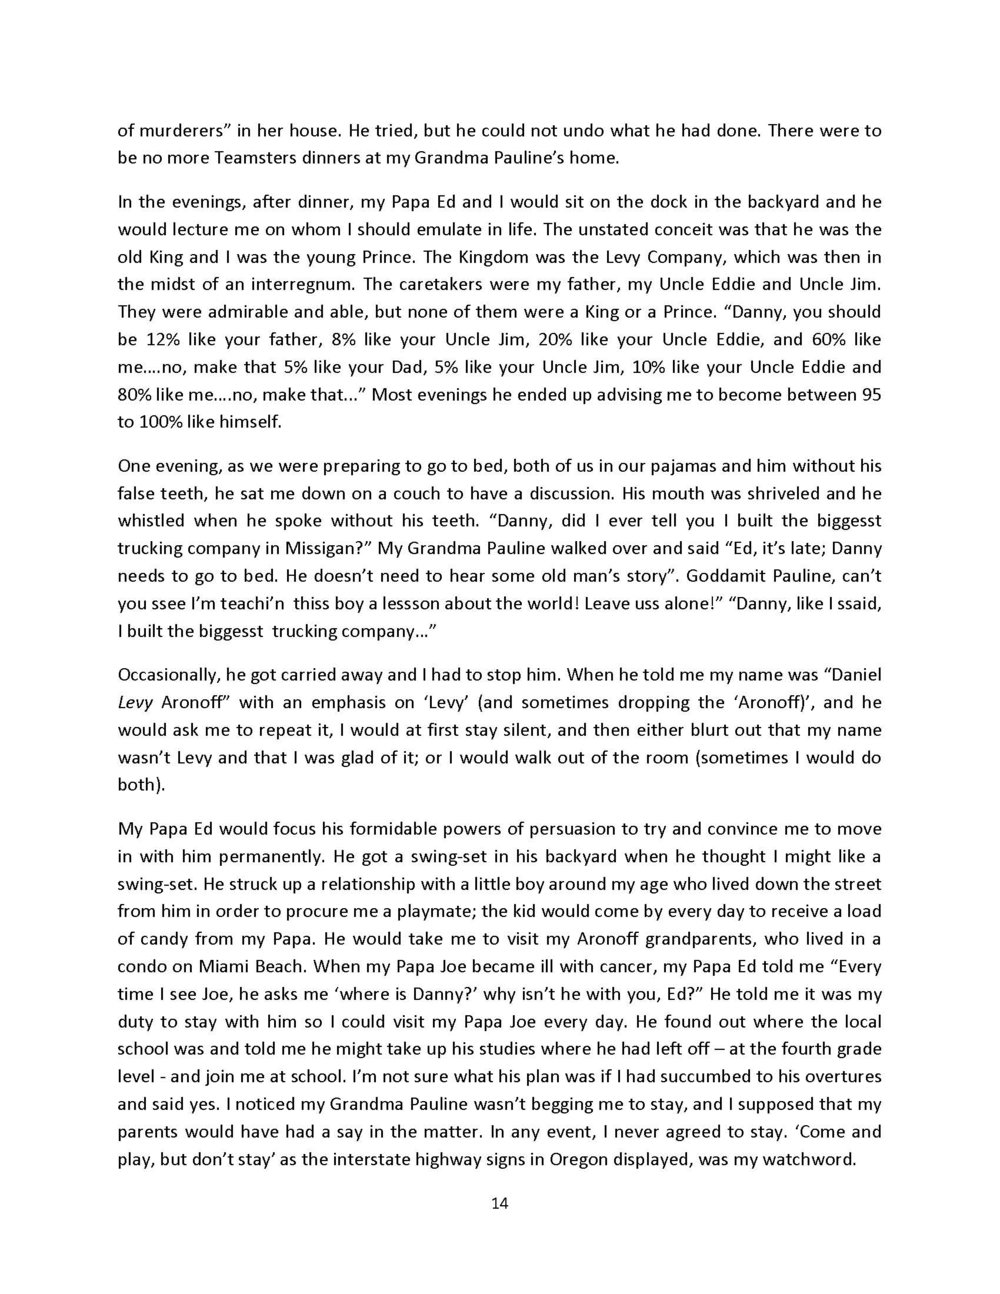 Papa Ed Stories -excerpts_Page_14.jpg